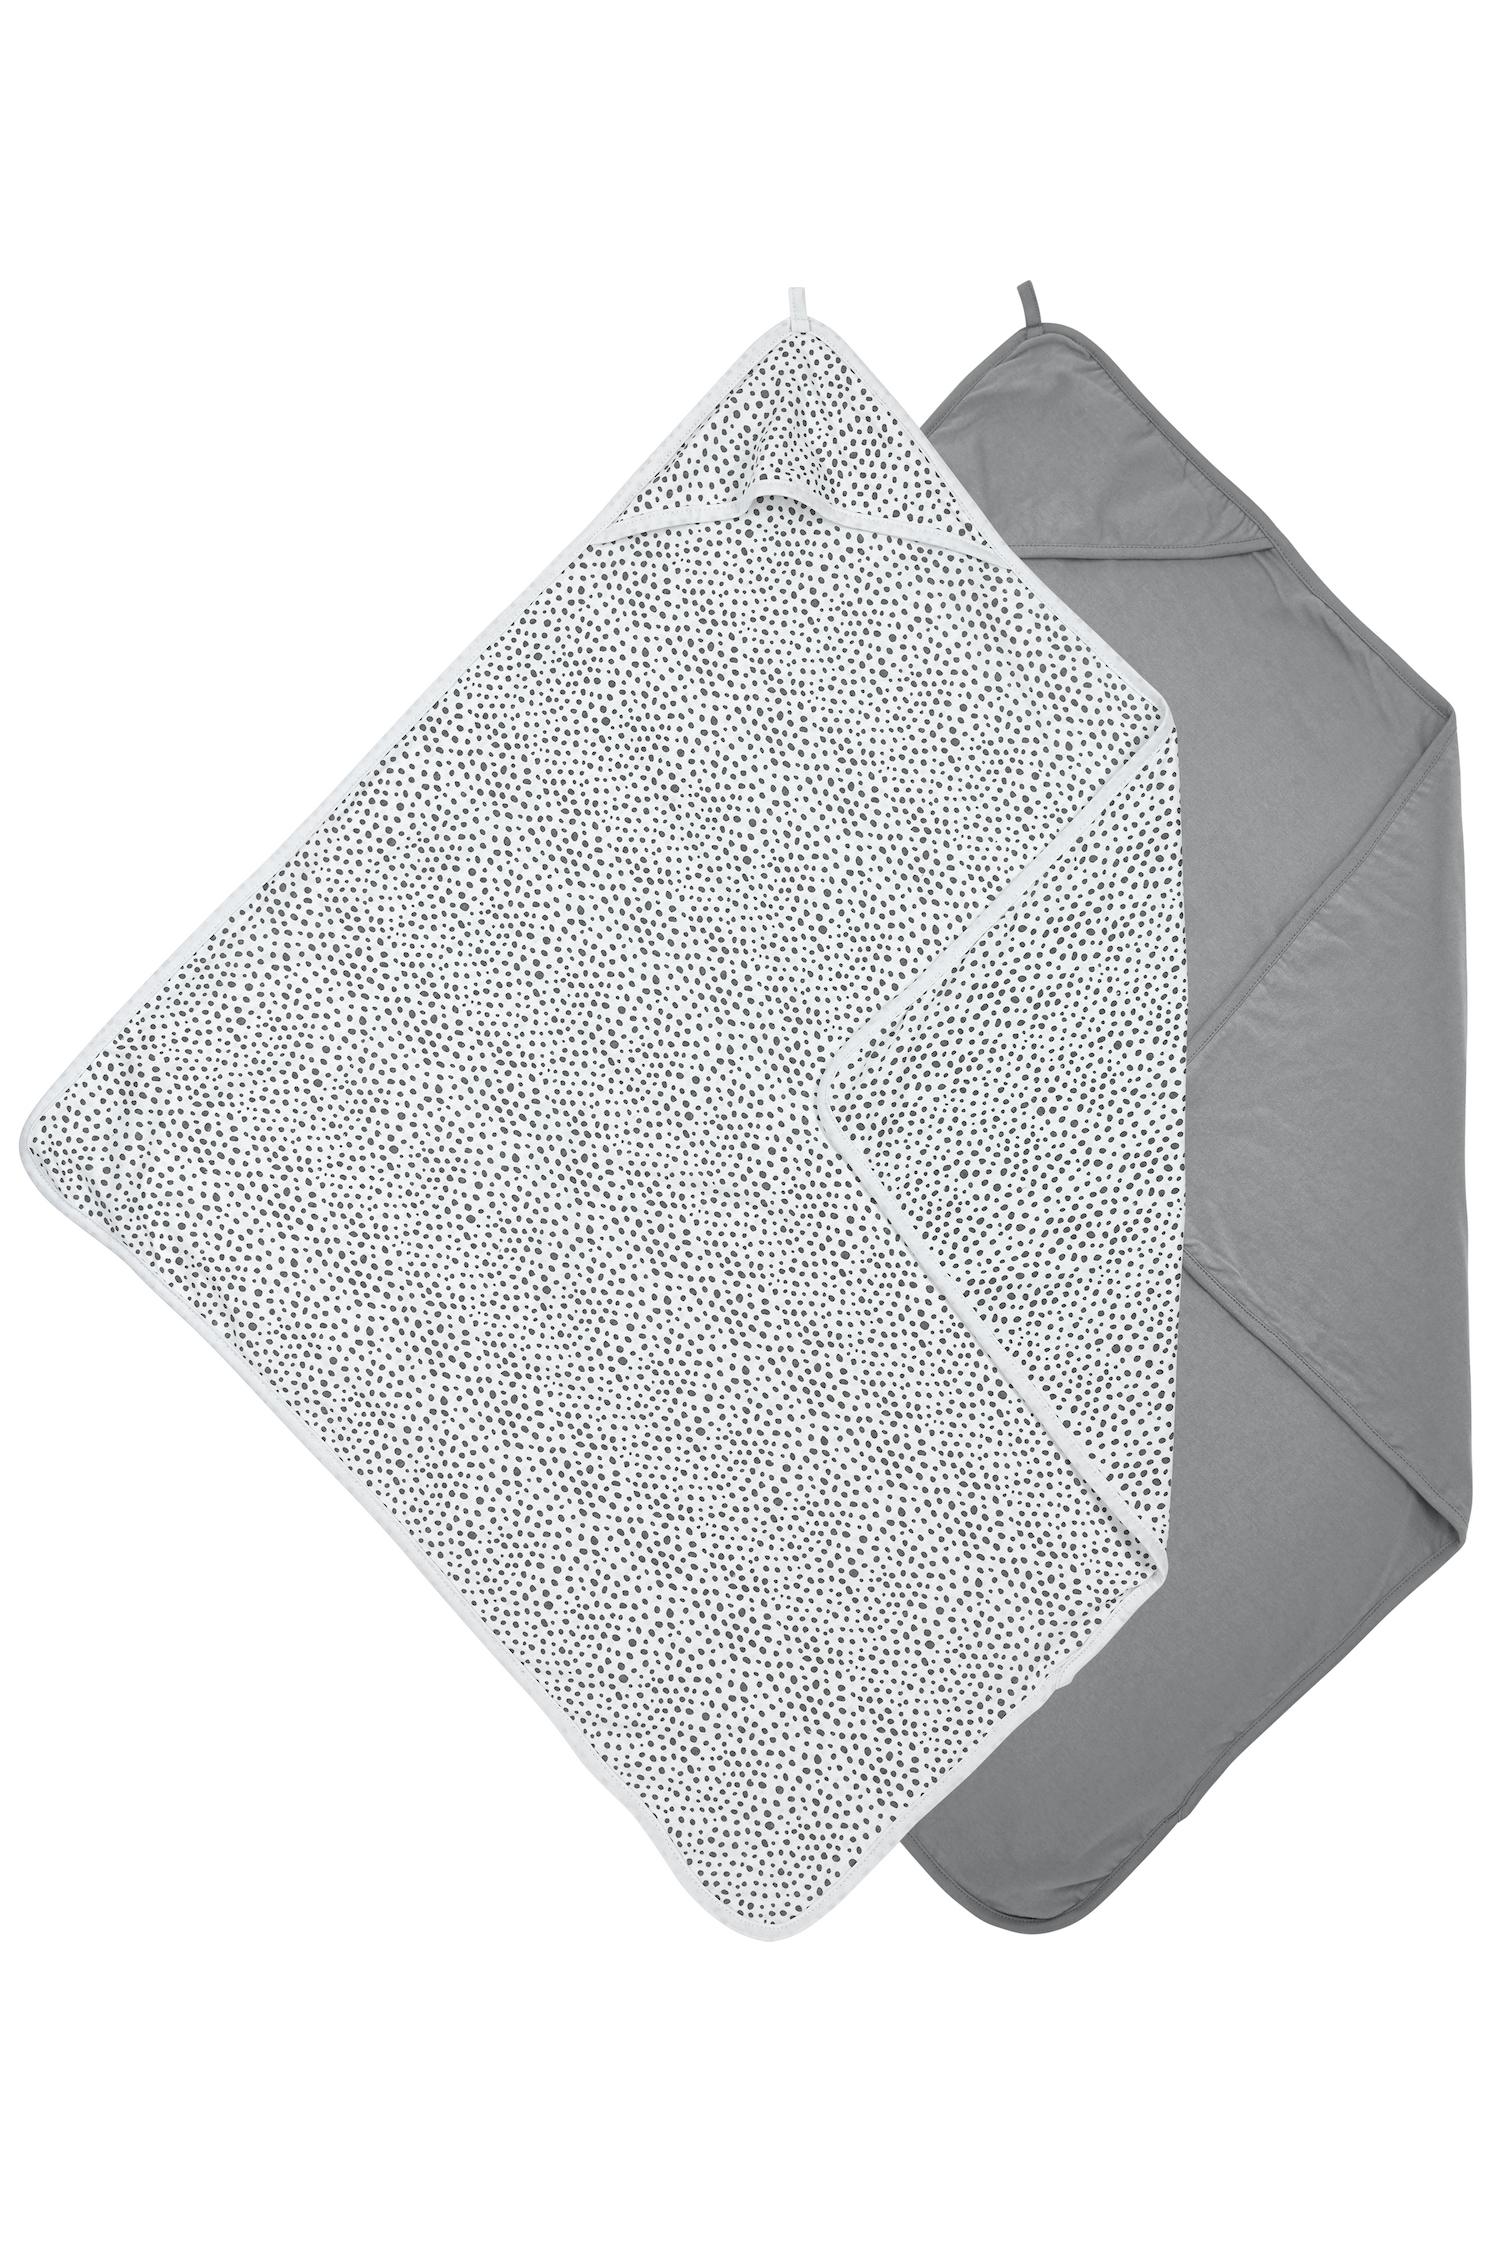 Kapuzentuch Basic Jersey/Cheetah 2-pack - Grau - 80x80cm